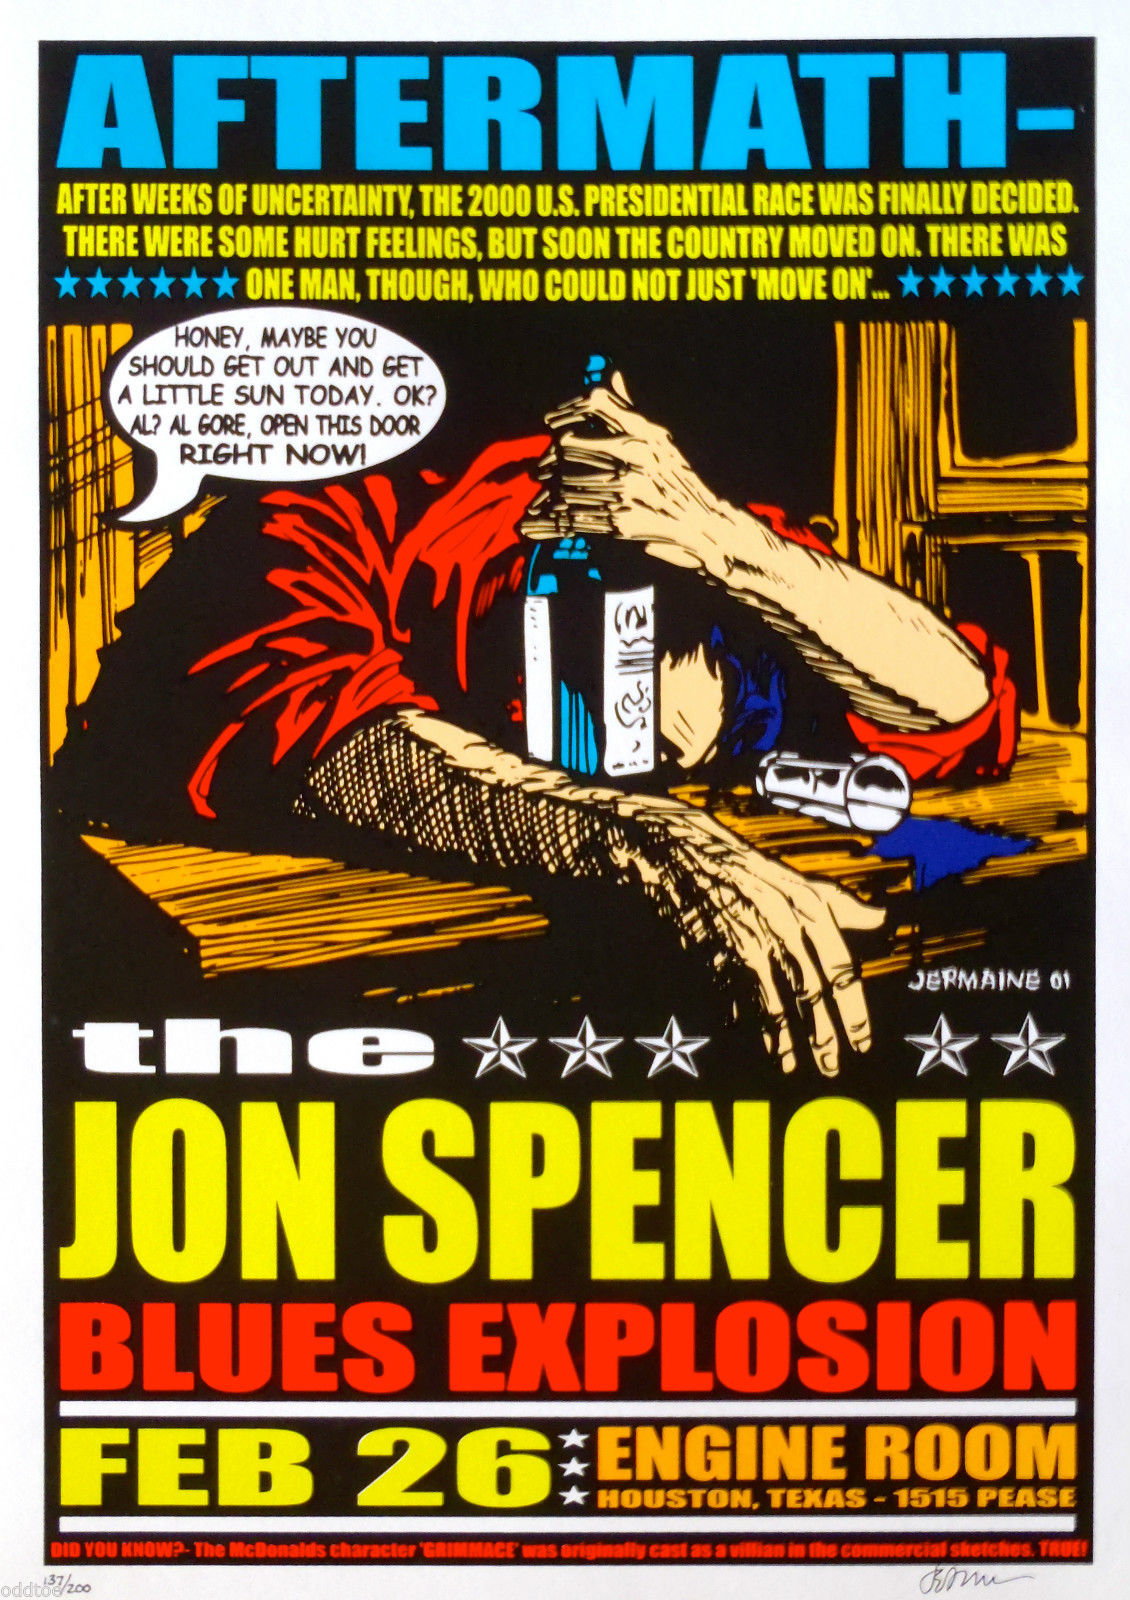 The Jon Spencer Blues Explosion - Engine Room, Houston, TX, US (26 February 2001)